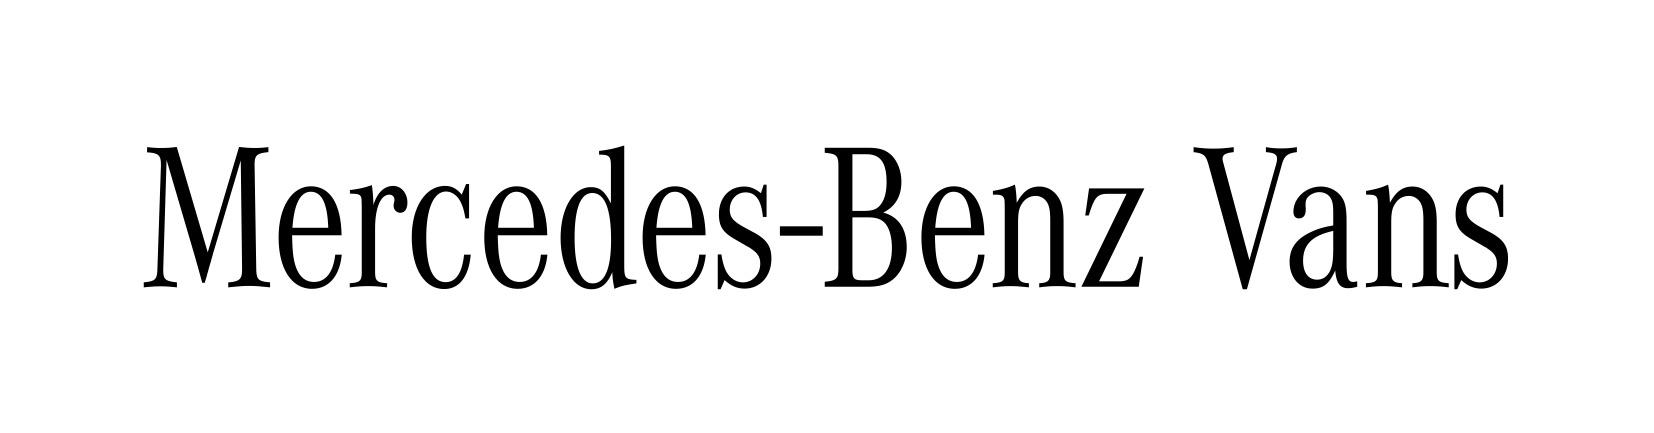 Mercedes-Benz Vans - Sponsorship Logo - POS - 4C.jpg